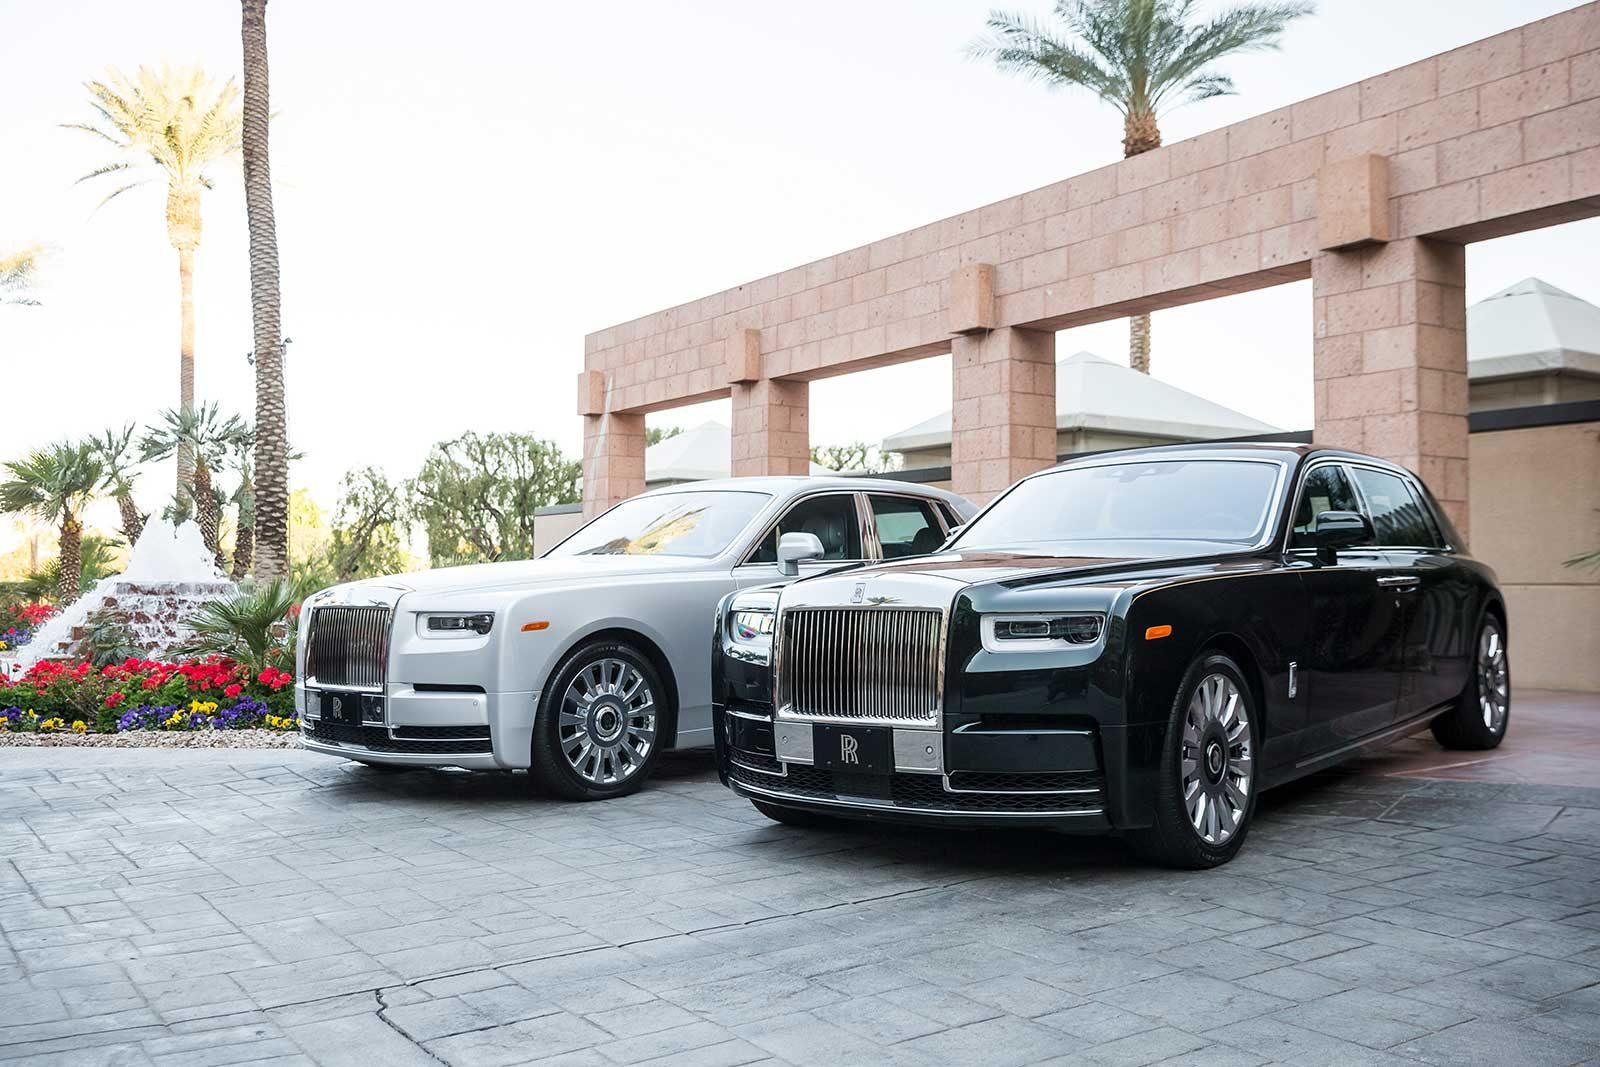 Review 2019 Rolls Royce Phantom The World S Best Car